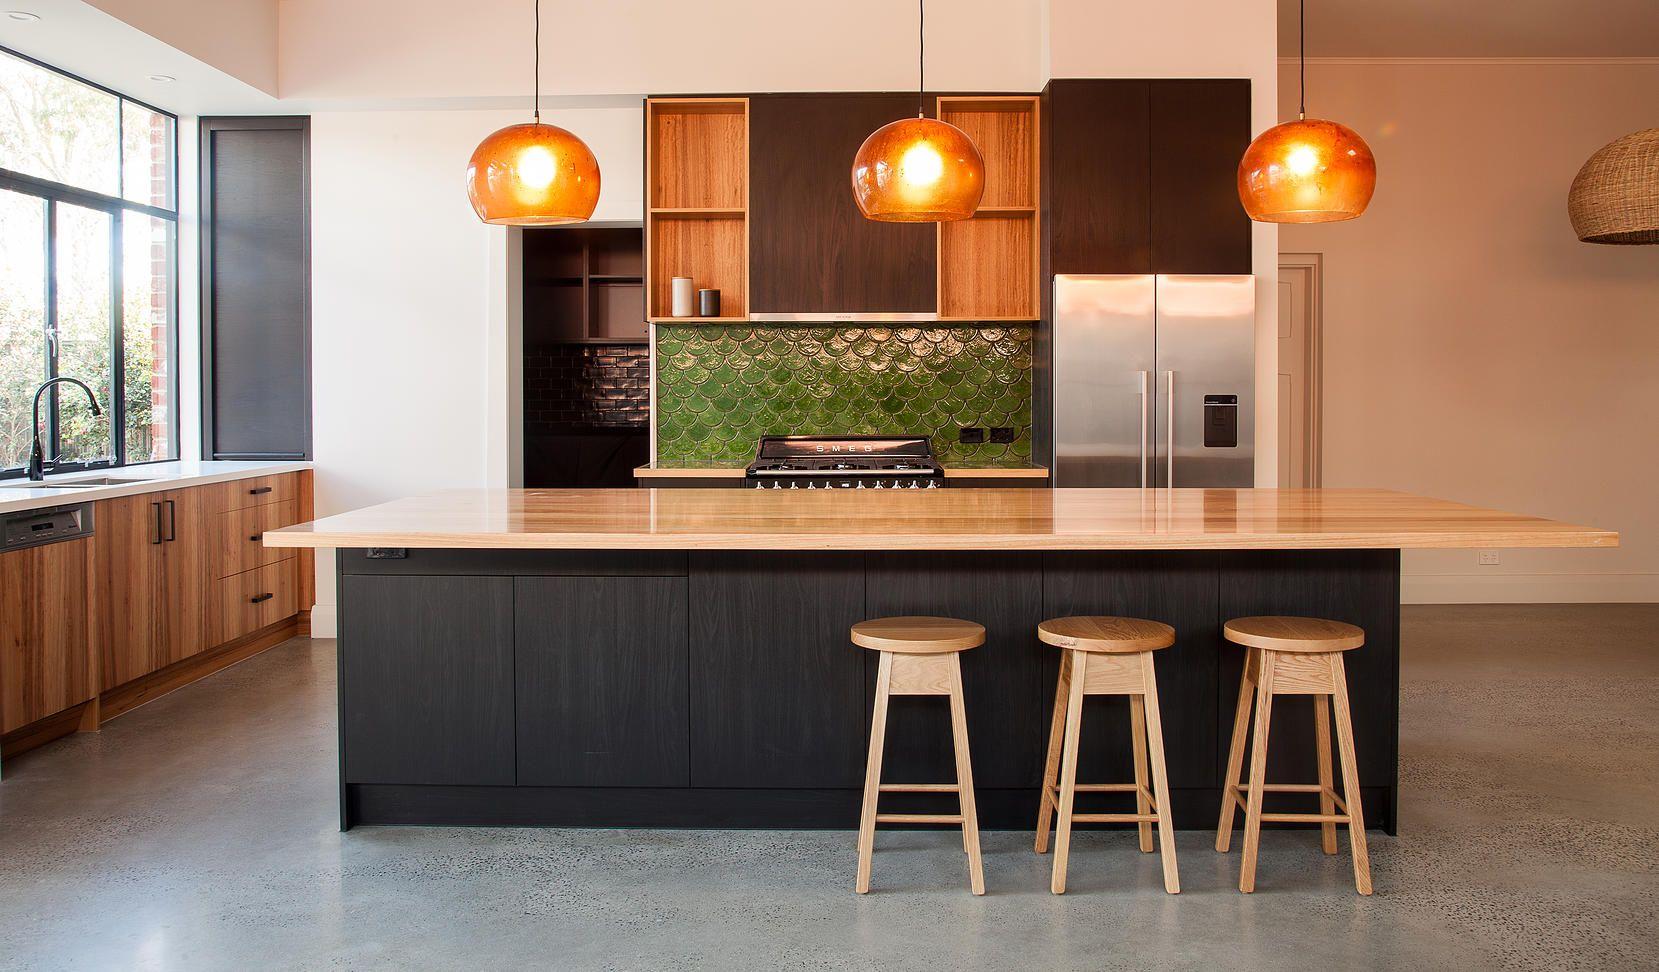 Fabrikate Creative Spaces Adelaide Modern Kitchen Design Home Kitchens Kitchen Design